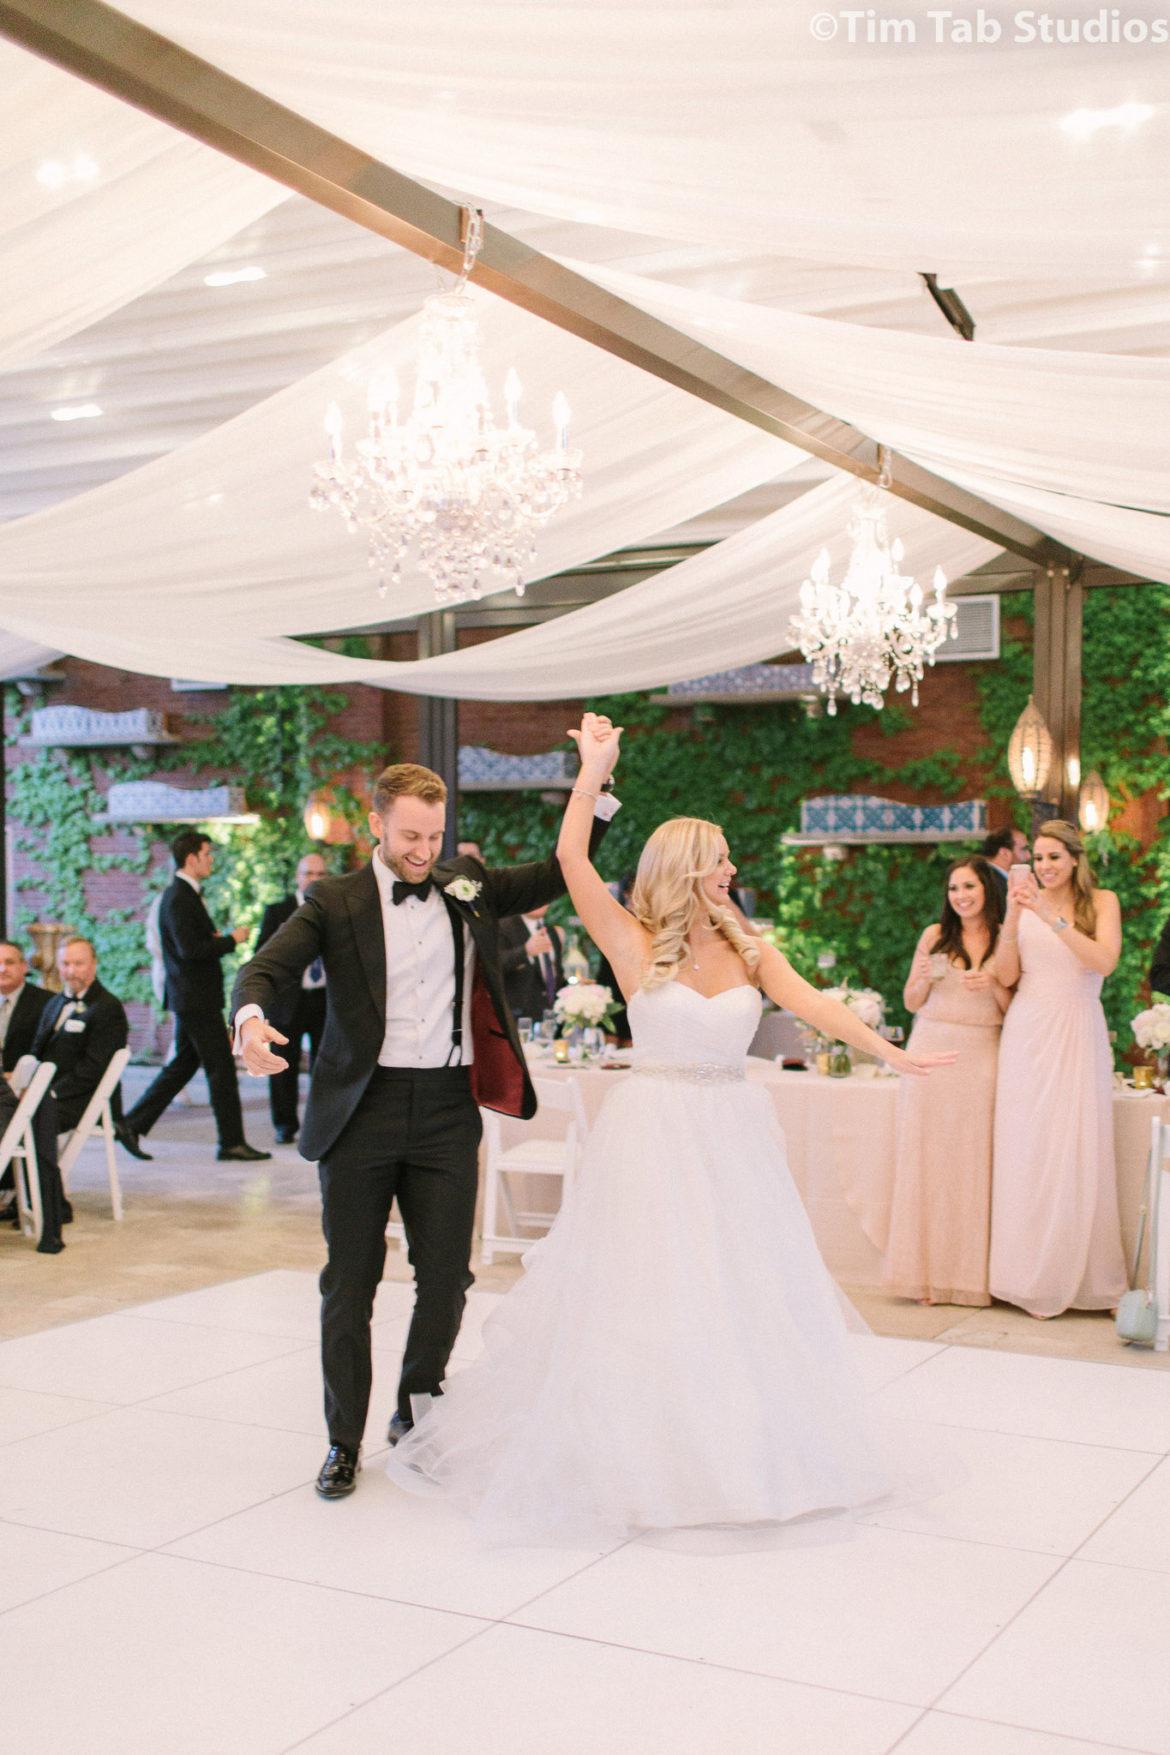 Elegant_Event_Lighting_Galleria_Marchetti_La_Pergola_Wedding_First_Dance_Crystal_Chandelier_Romantic_Ceiling_Draping_Elegant